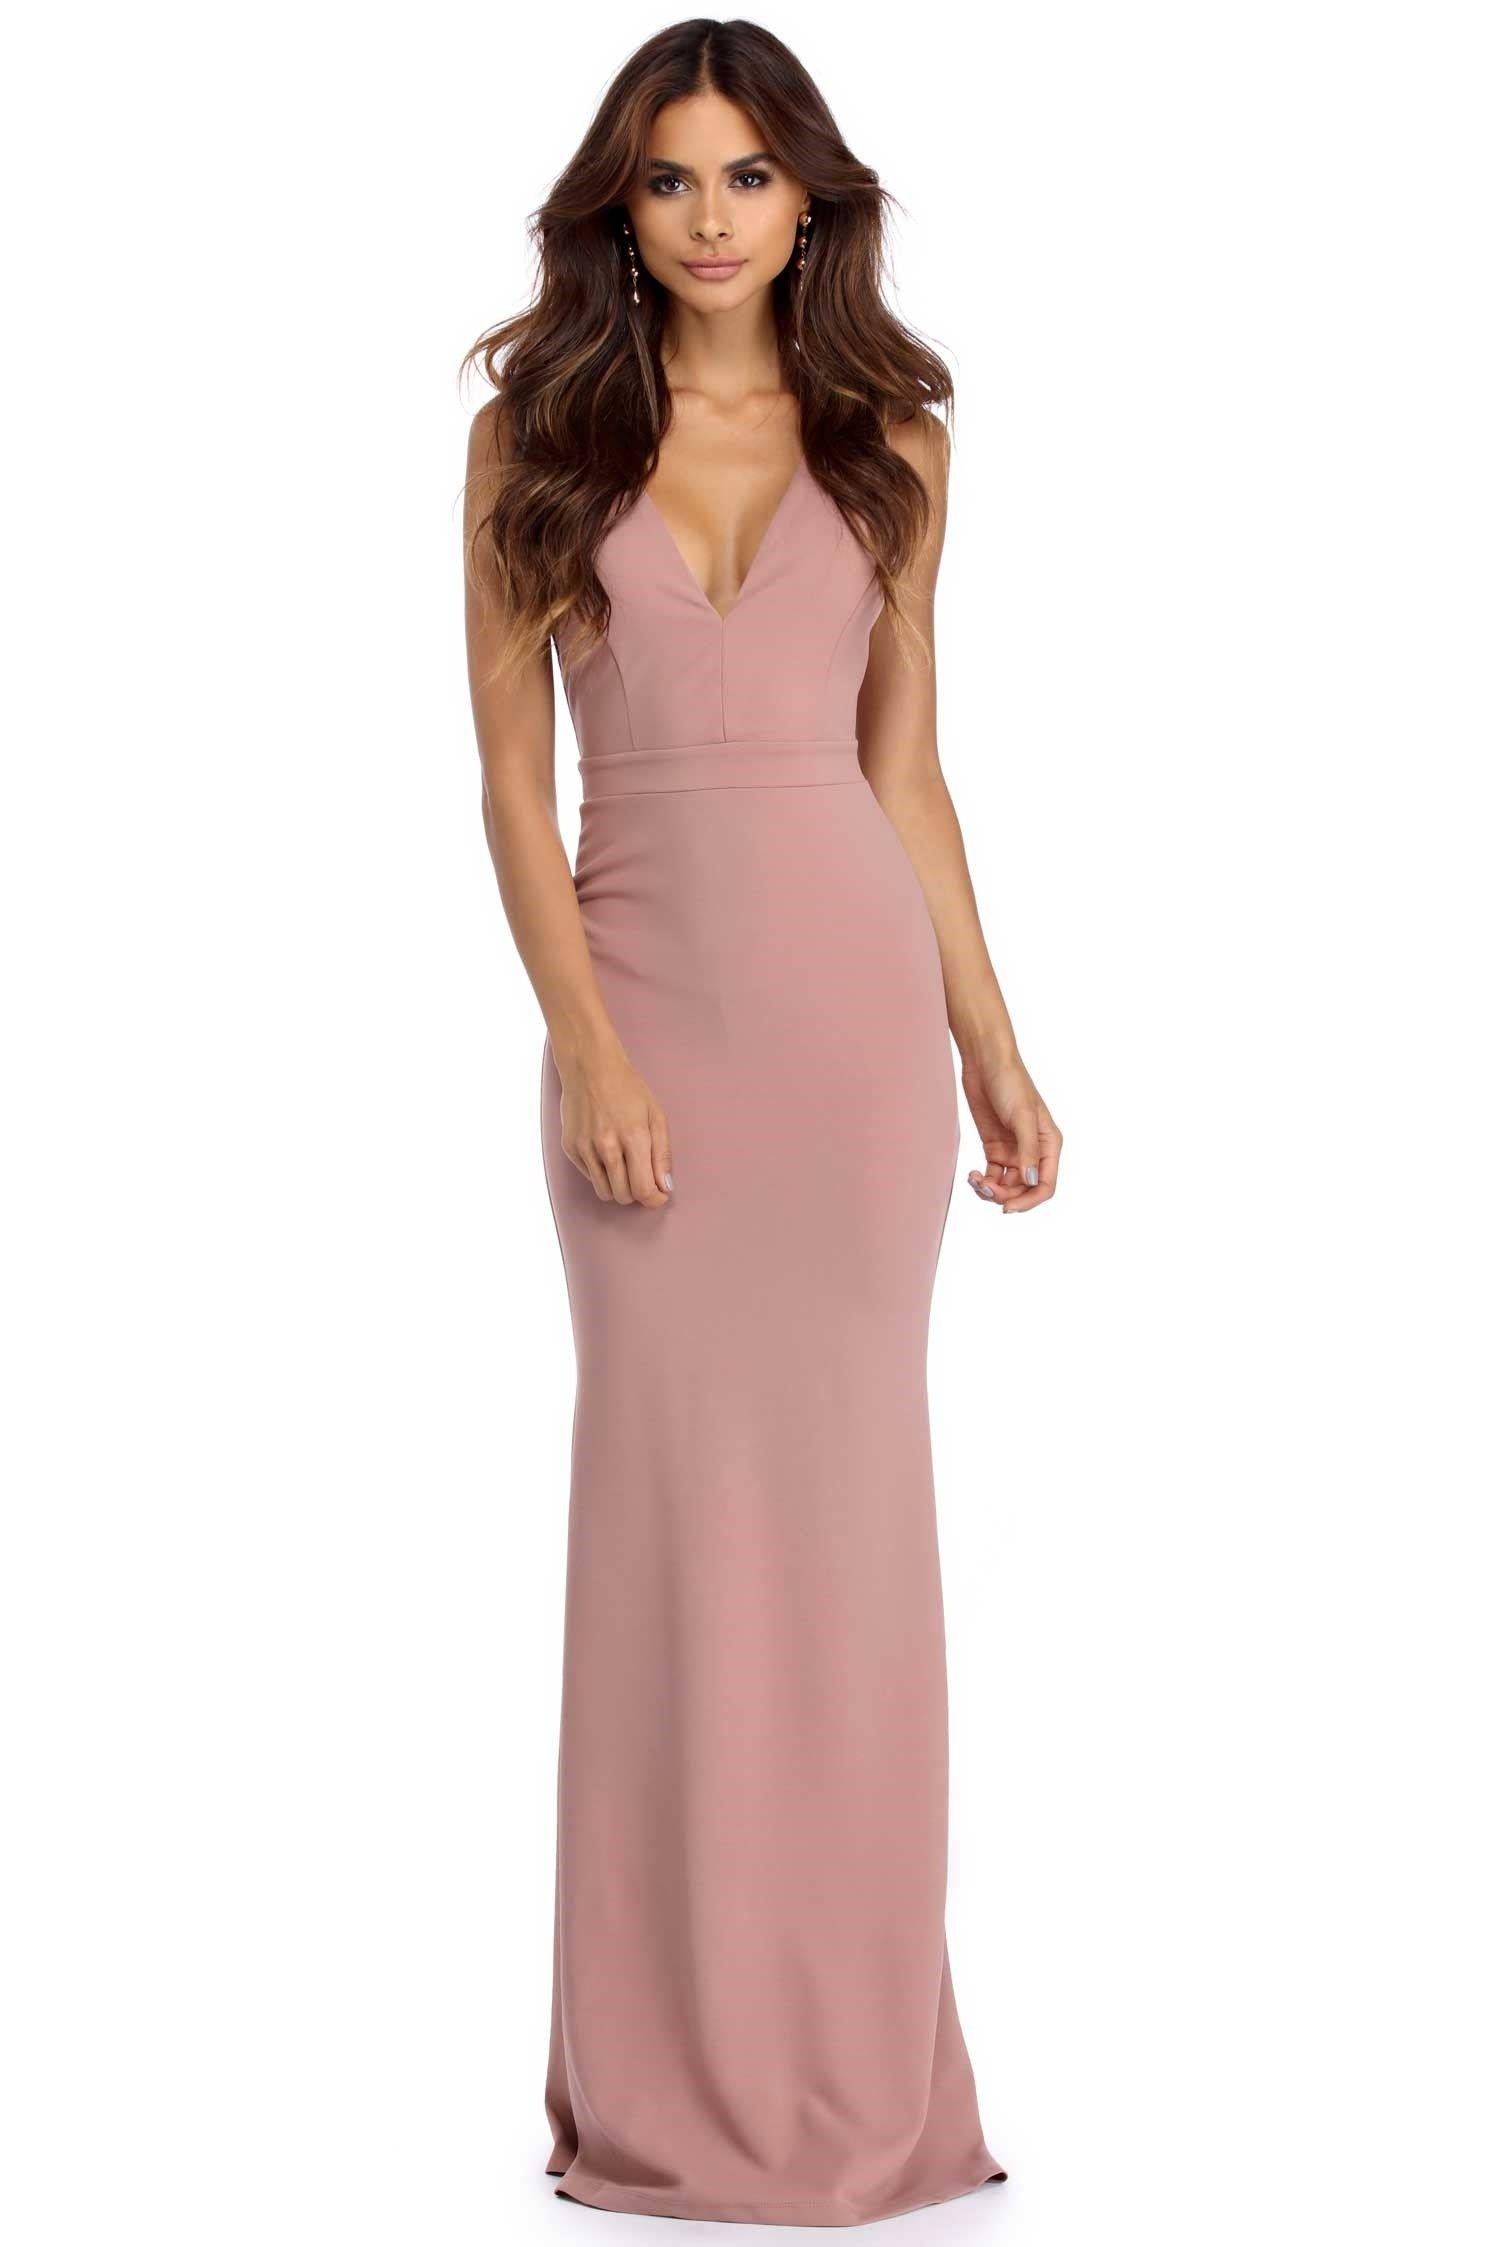 Miriam Lady In Pink Dress   Prom   Pinterest